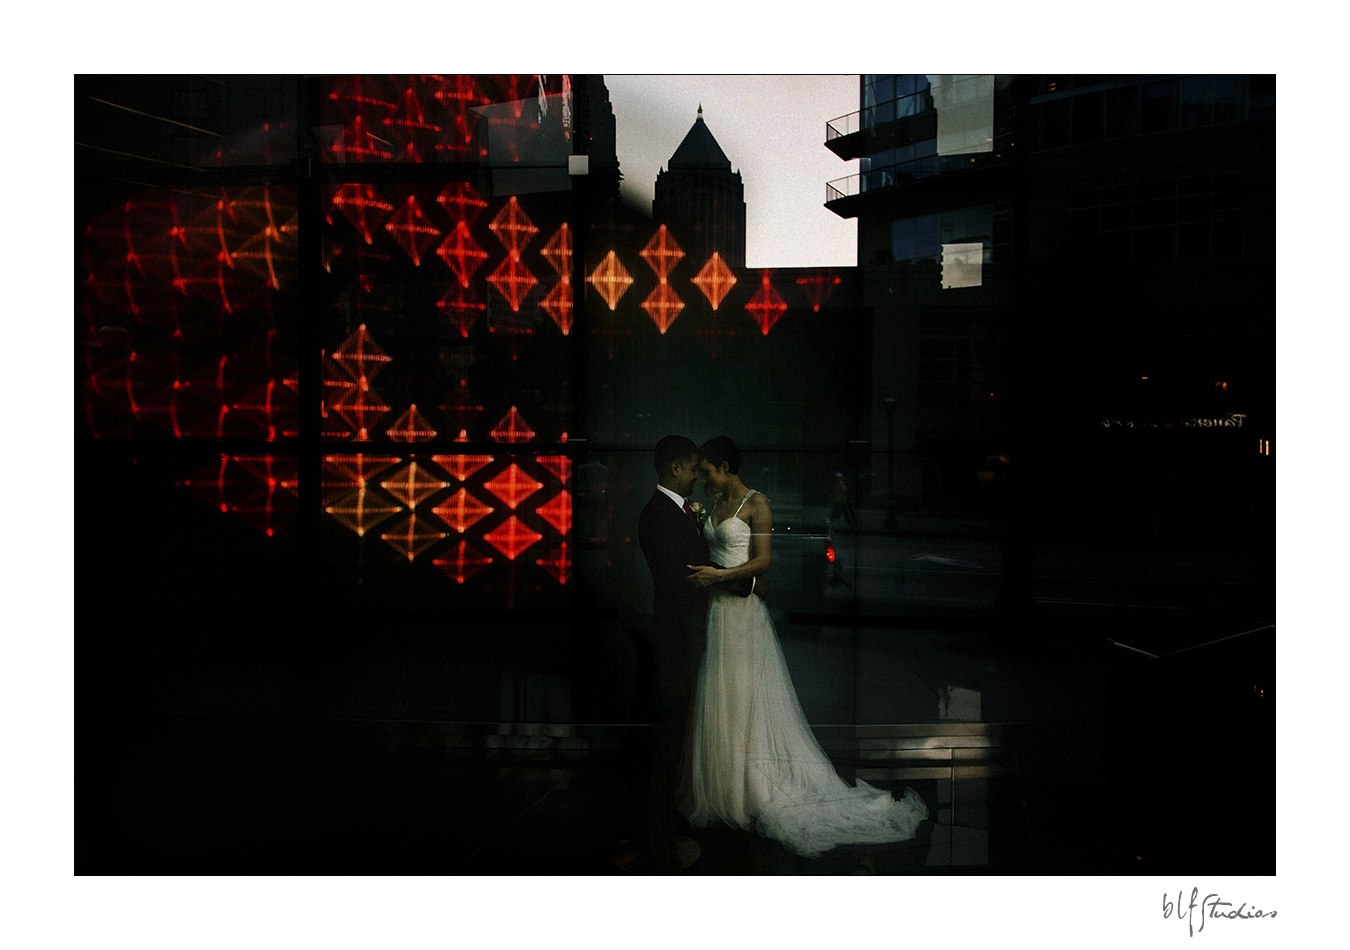 0025-blfstudios-wedding-photographer-daniel-danielle-atlanta.jpg